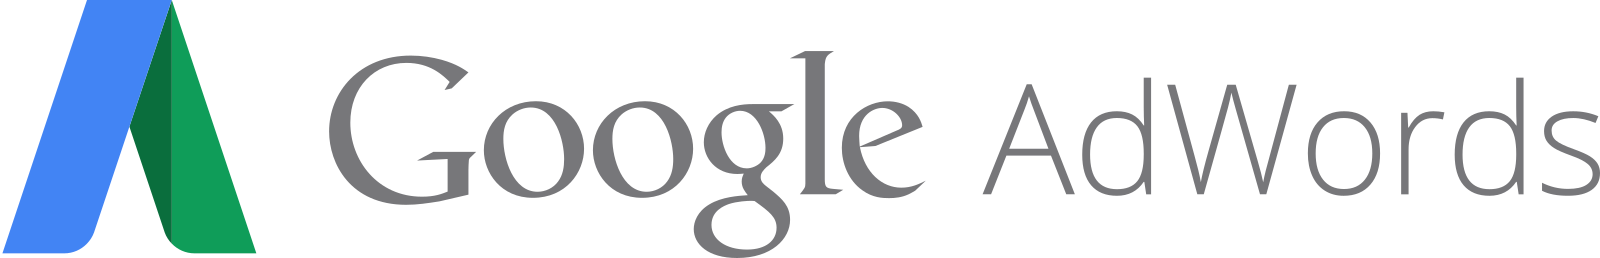 google adwords logo 5 - Google AdWords Logo